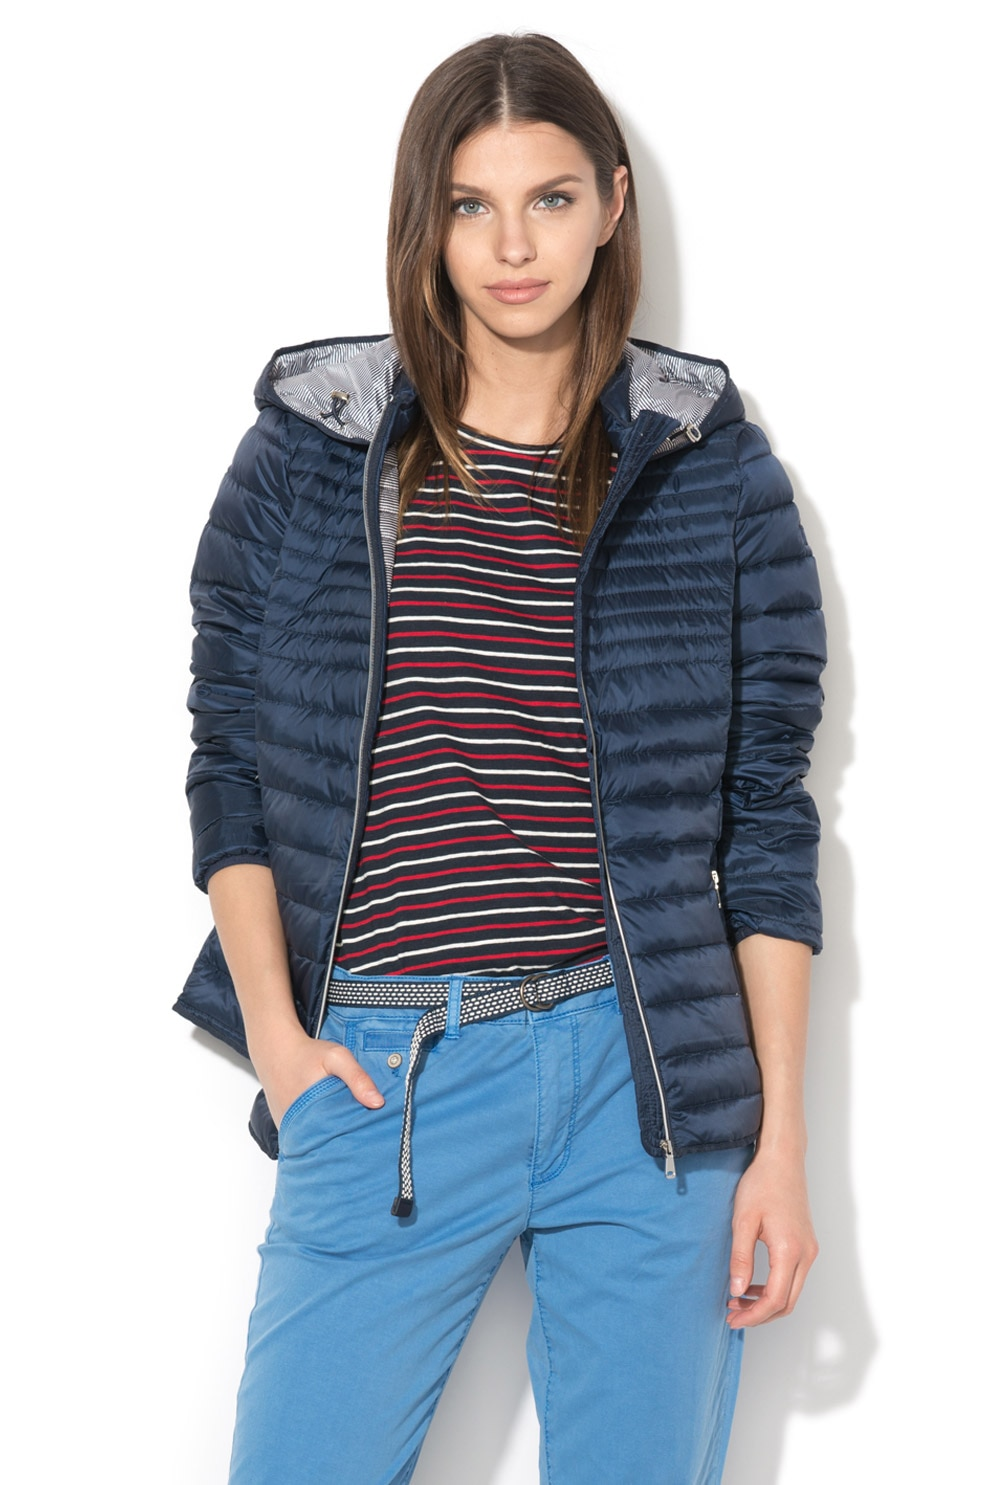 Esprit, Pihével bélelt, kapucnis dzseki, Drapp, L eMAG.hu